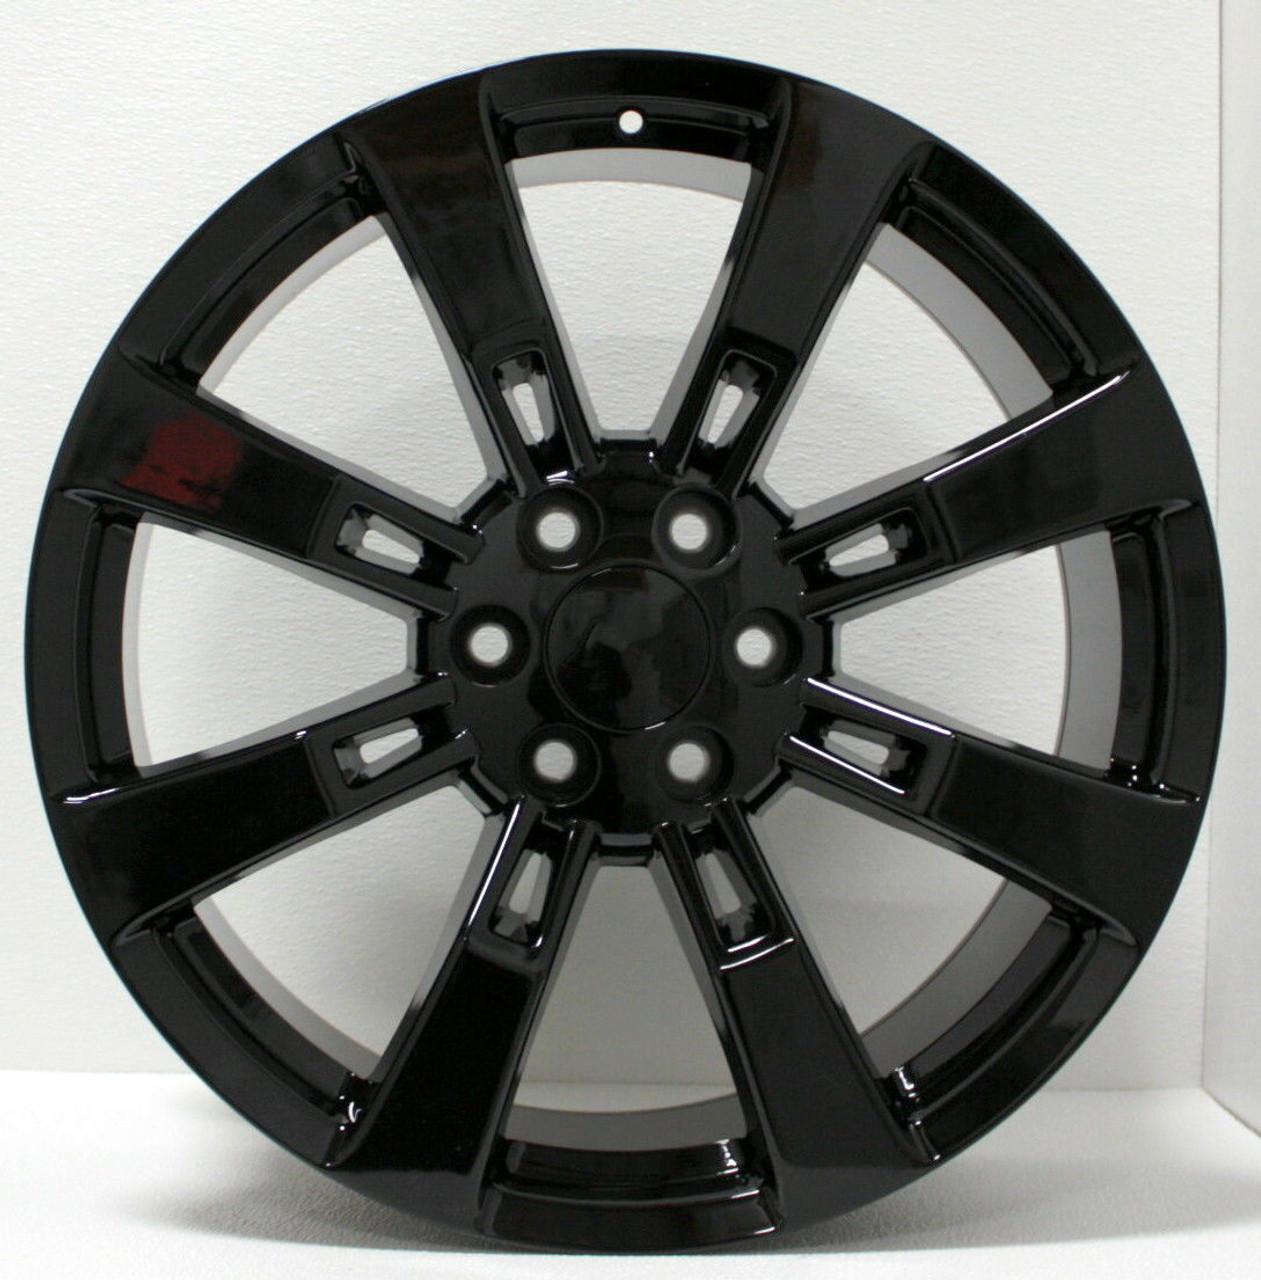 spoke wheels gmc yukon denali sierra gloss eight rims inch tires truck brand